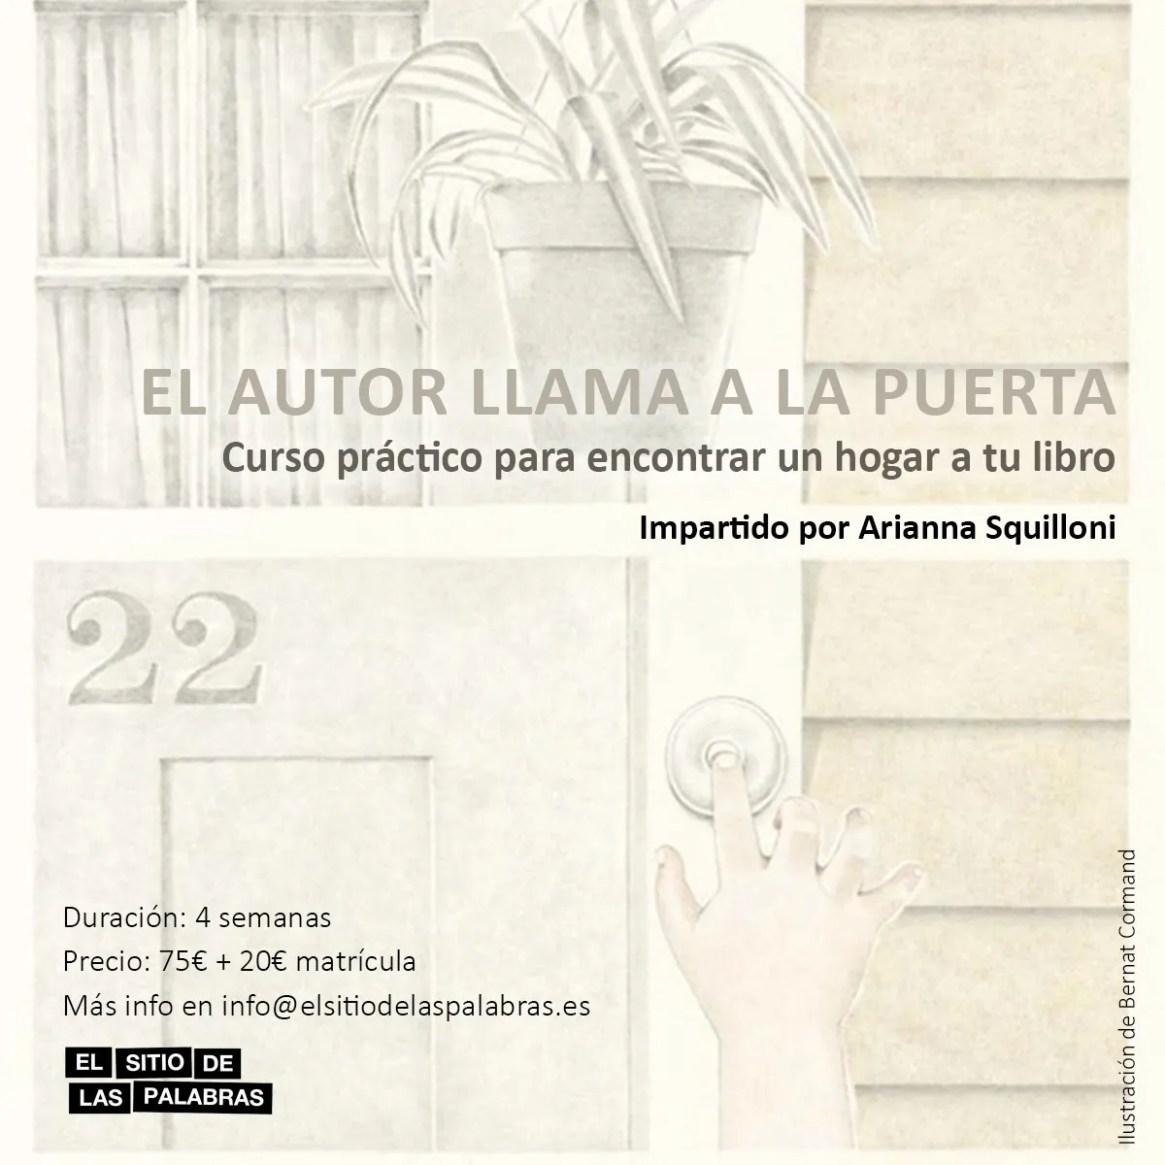 EL AUTOR LLAMA A LA PUERTA 01